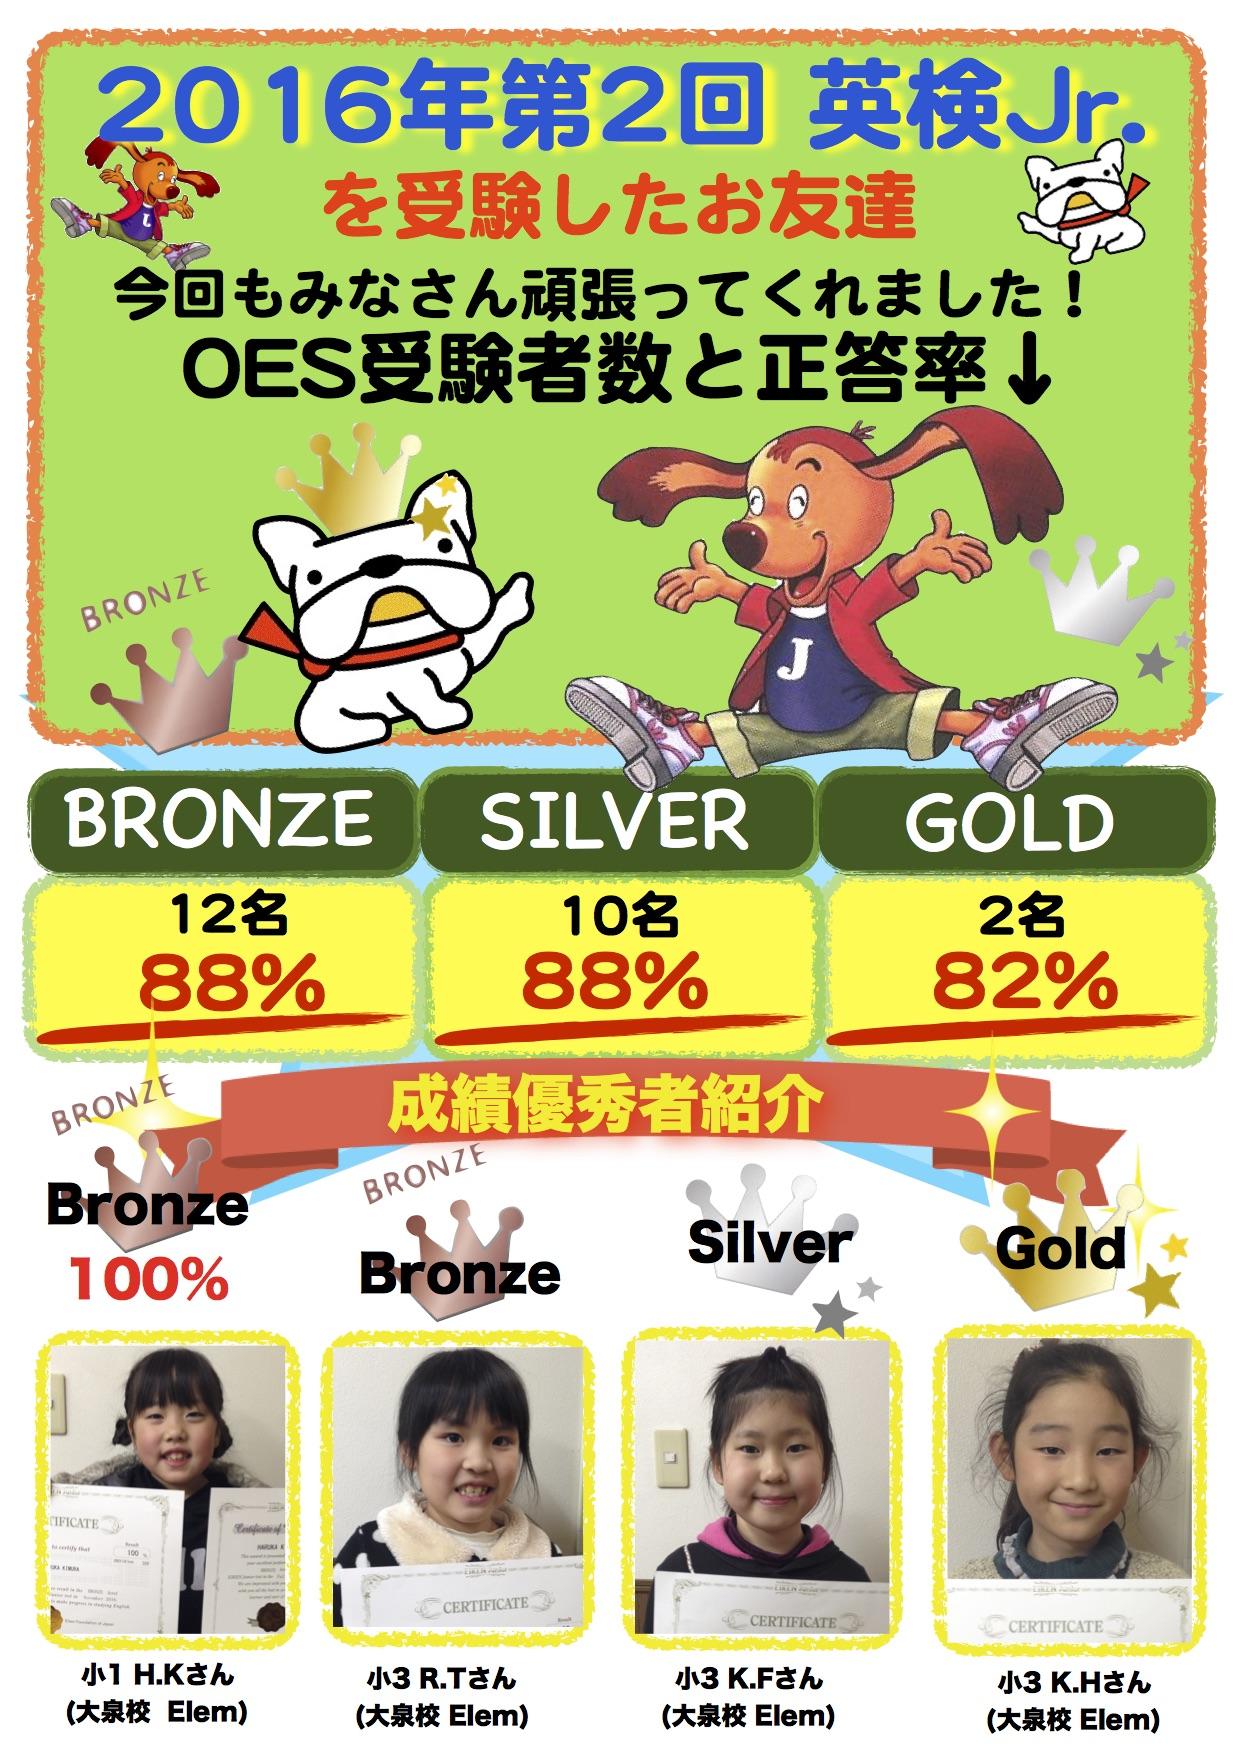 ①GL:生徒写真入り 2016-2回英検Jr. 結果報告 ポスター